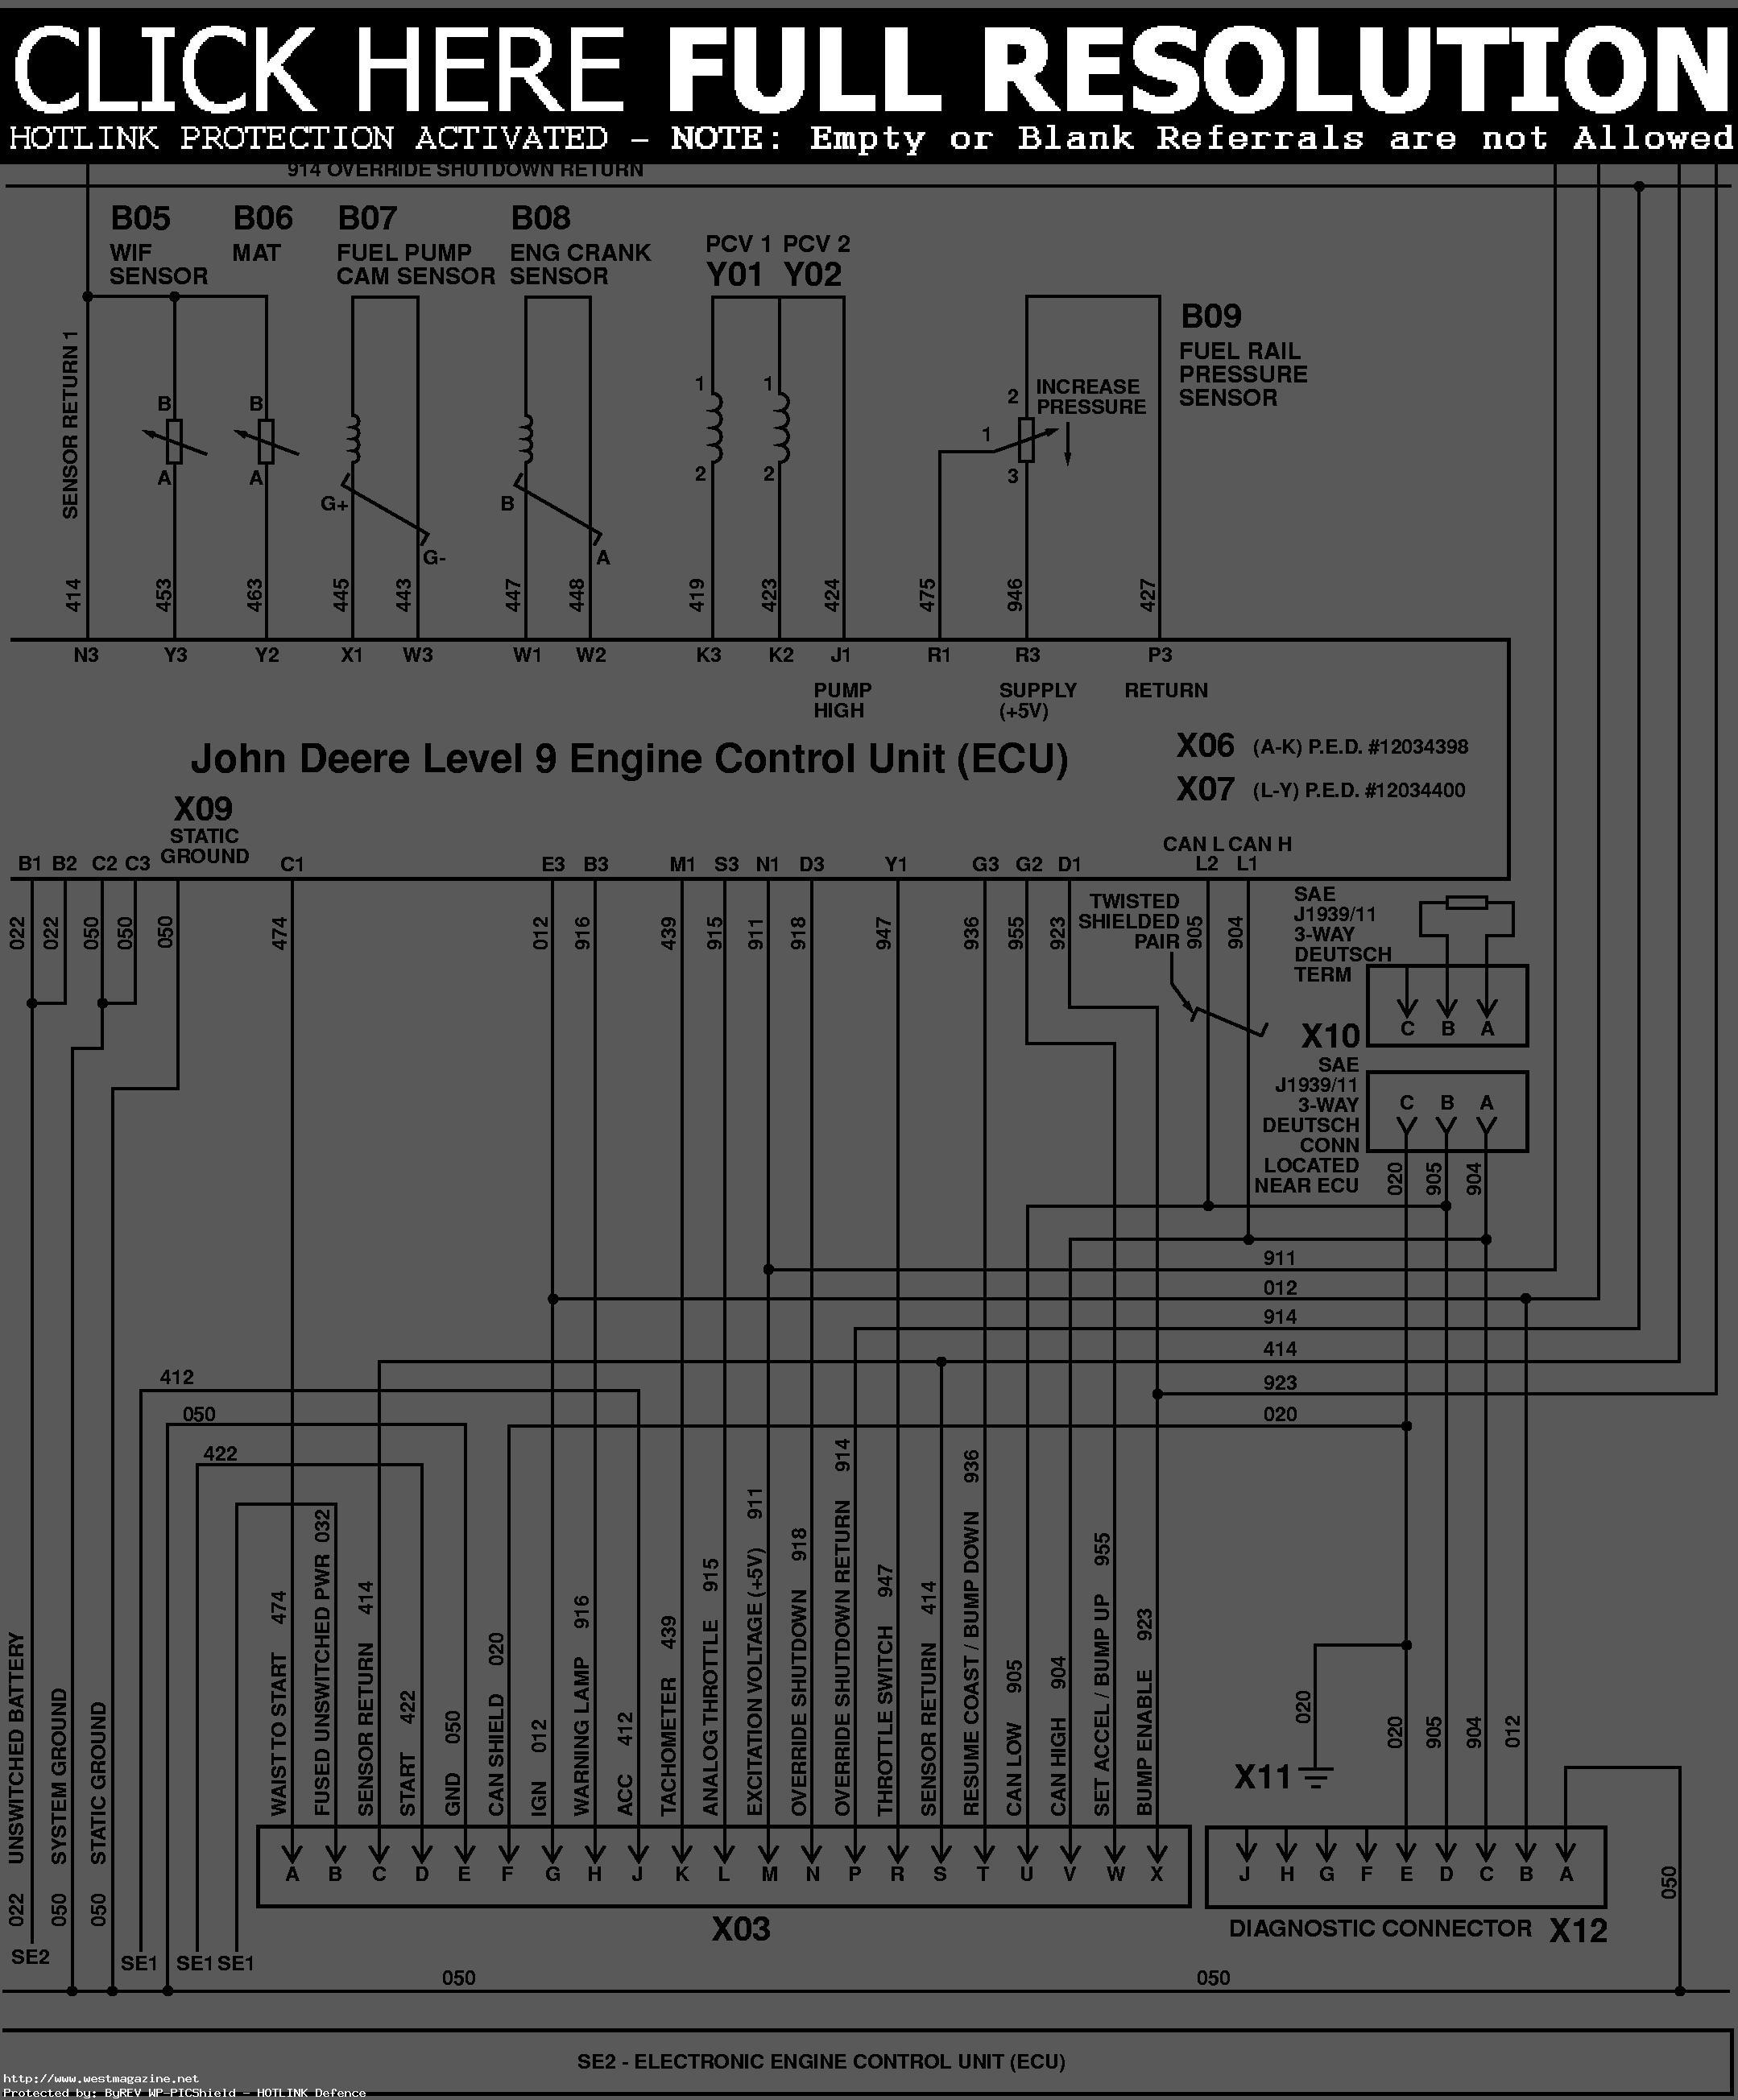 Mnl-2785] John Deere Lt155 Technical Manual   2019 Ebook Library - John Deere Lt155 Wiring Diagram